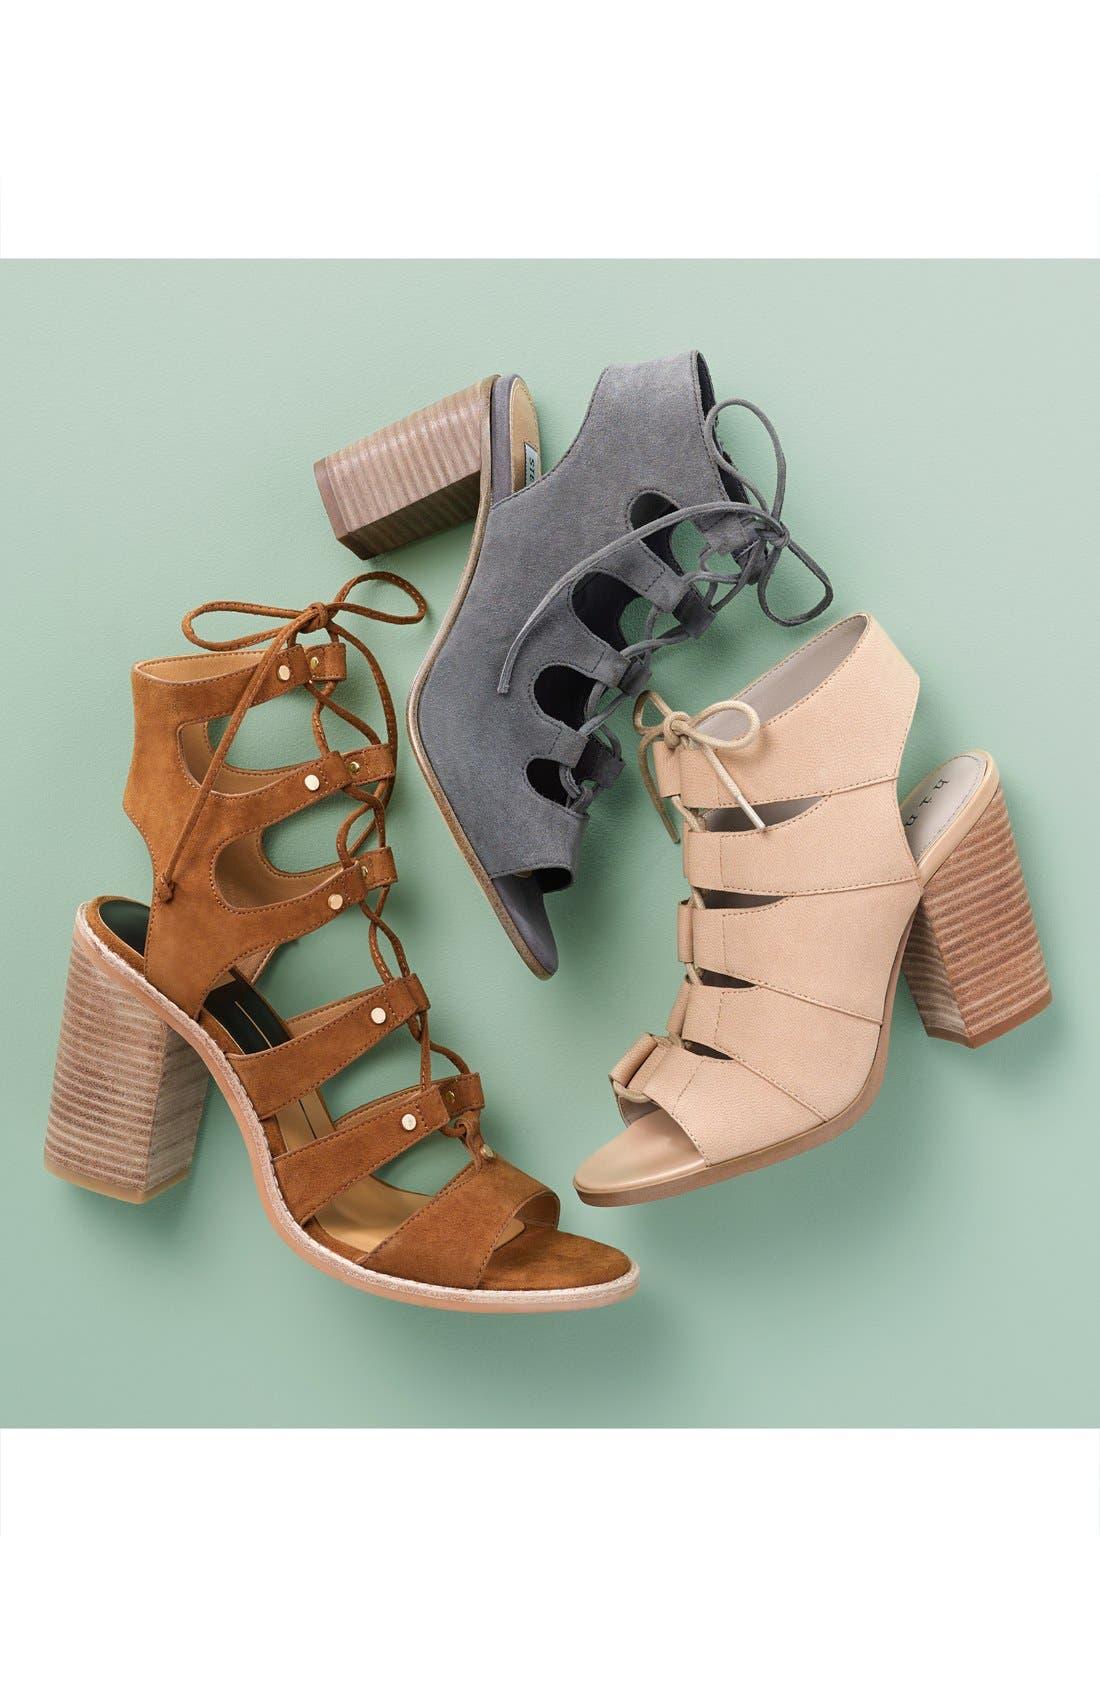 HINGE 'Drea' Peep Toe Leather Sandal, Main, color, 002